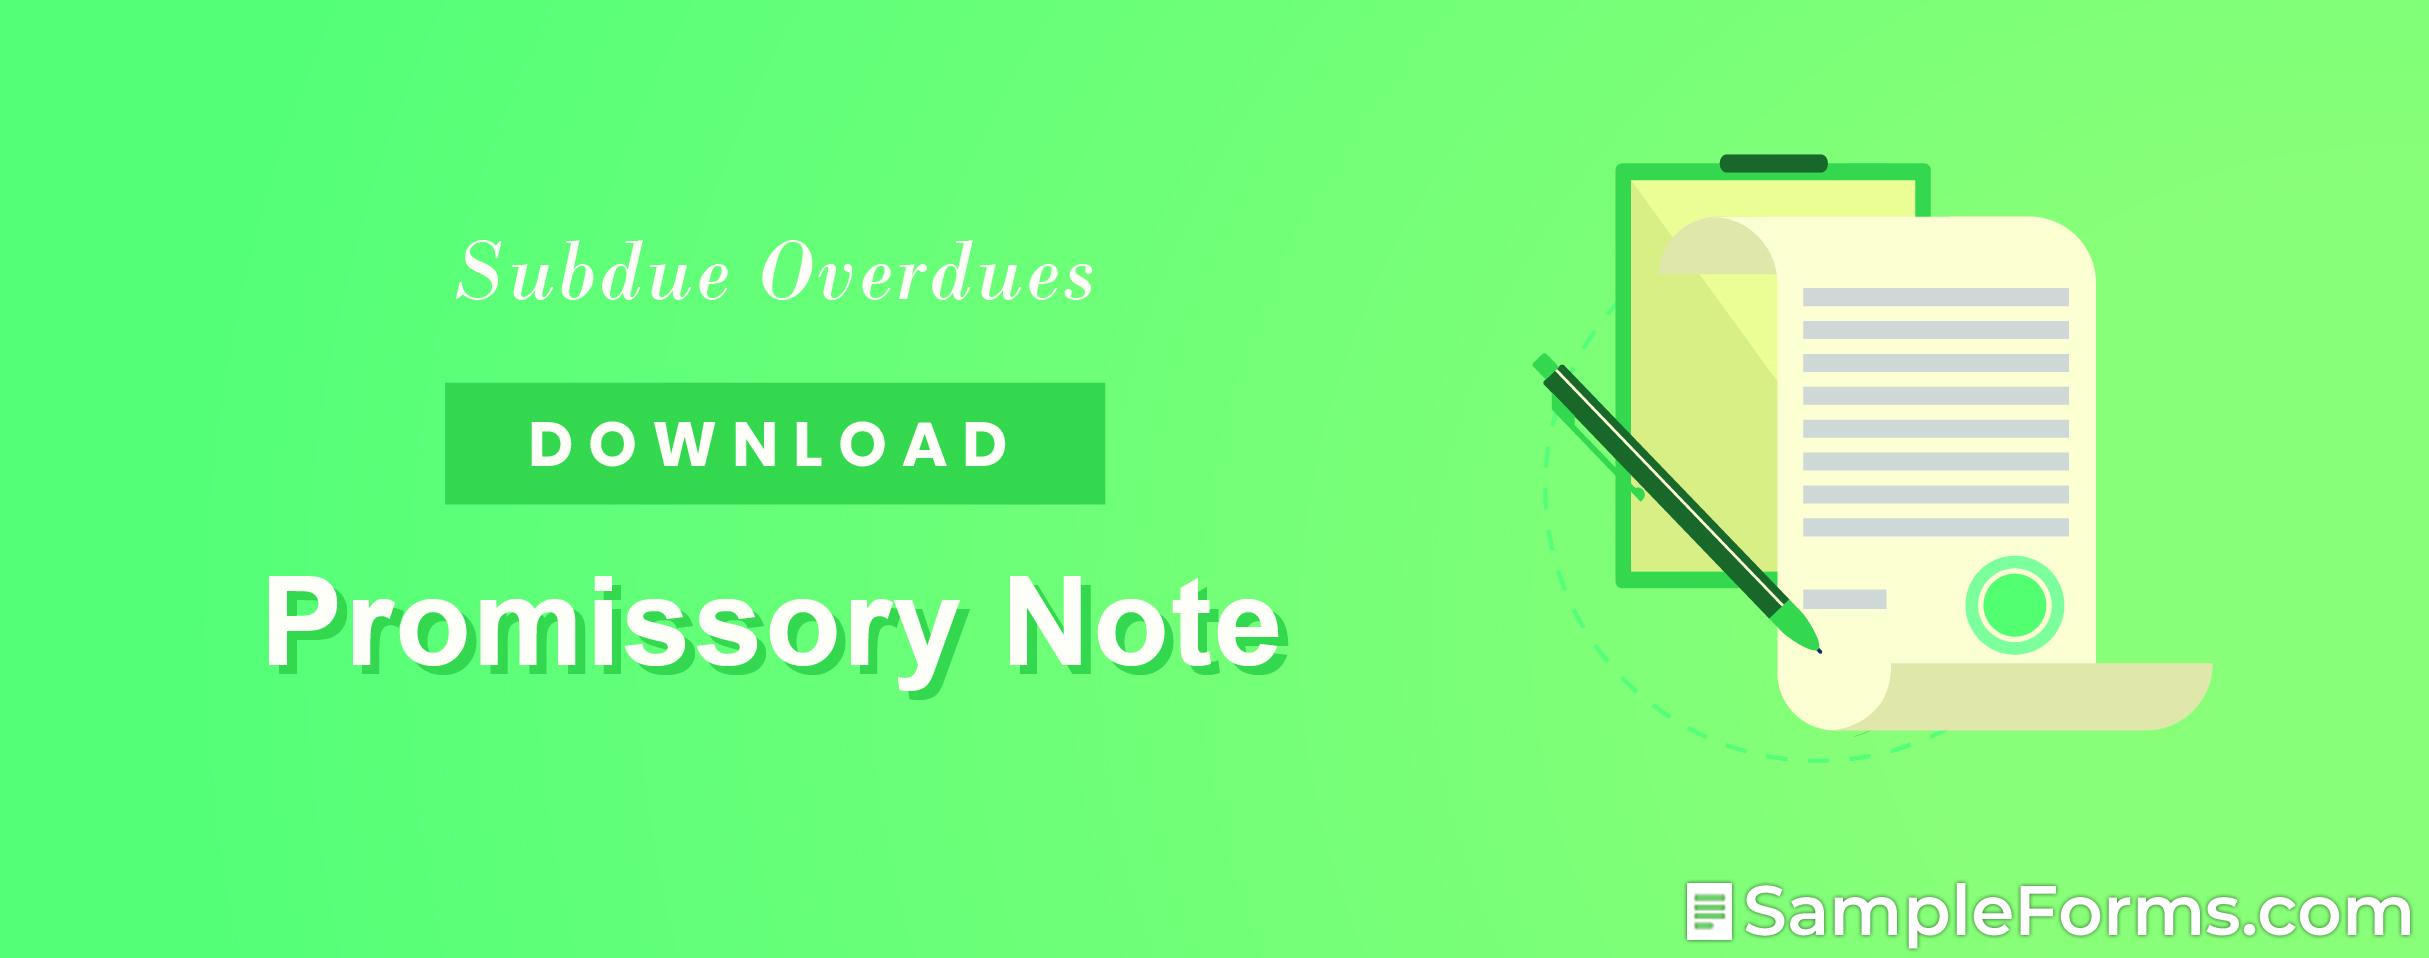 Promissory Note1